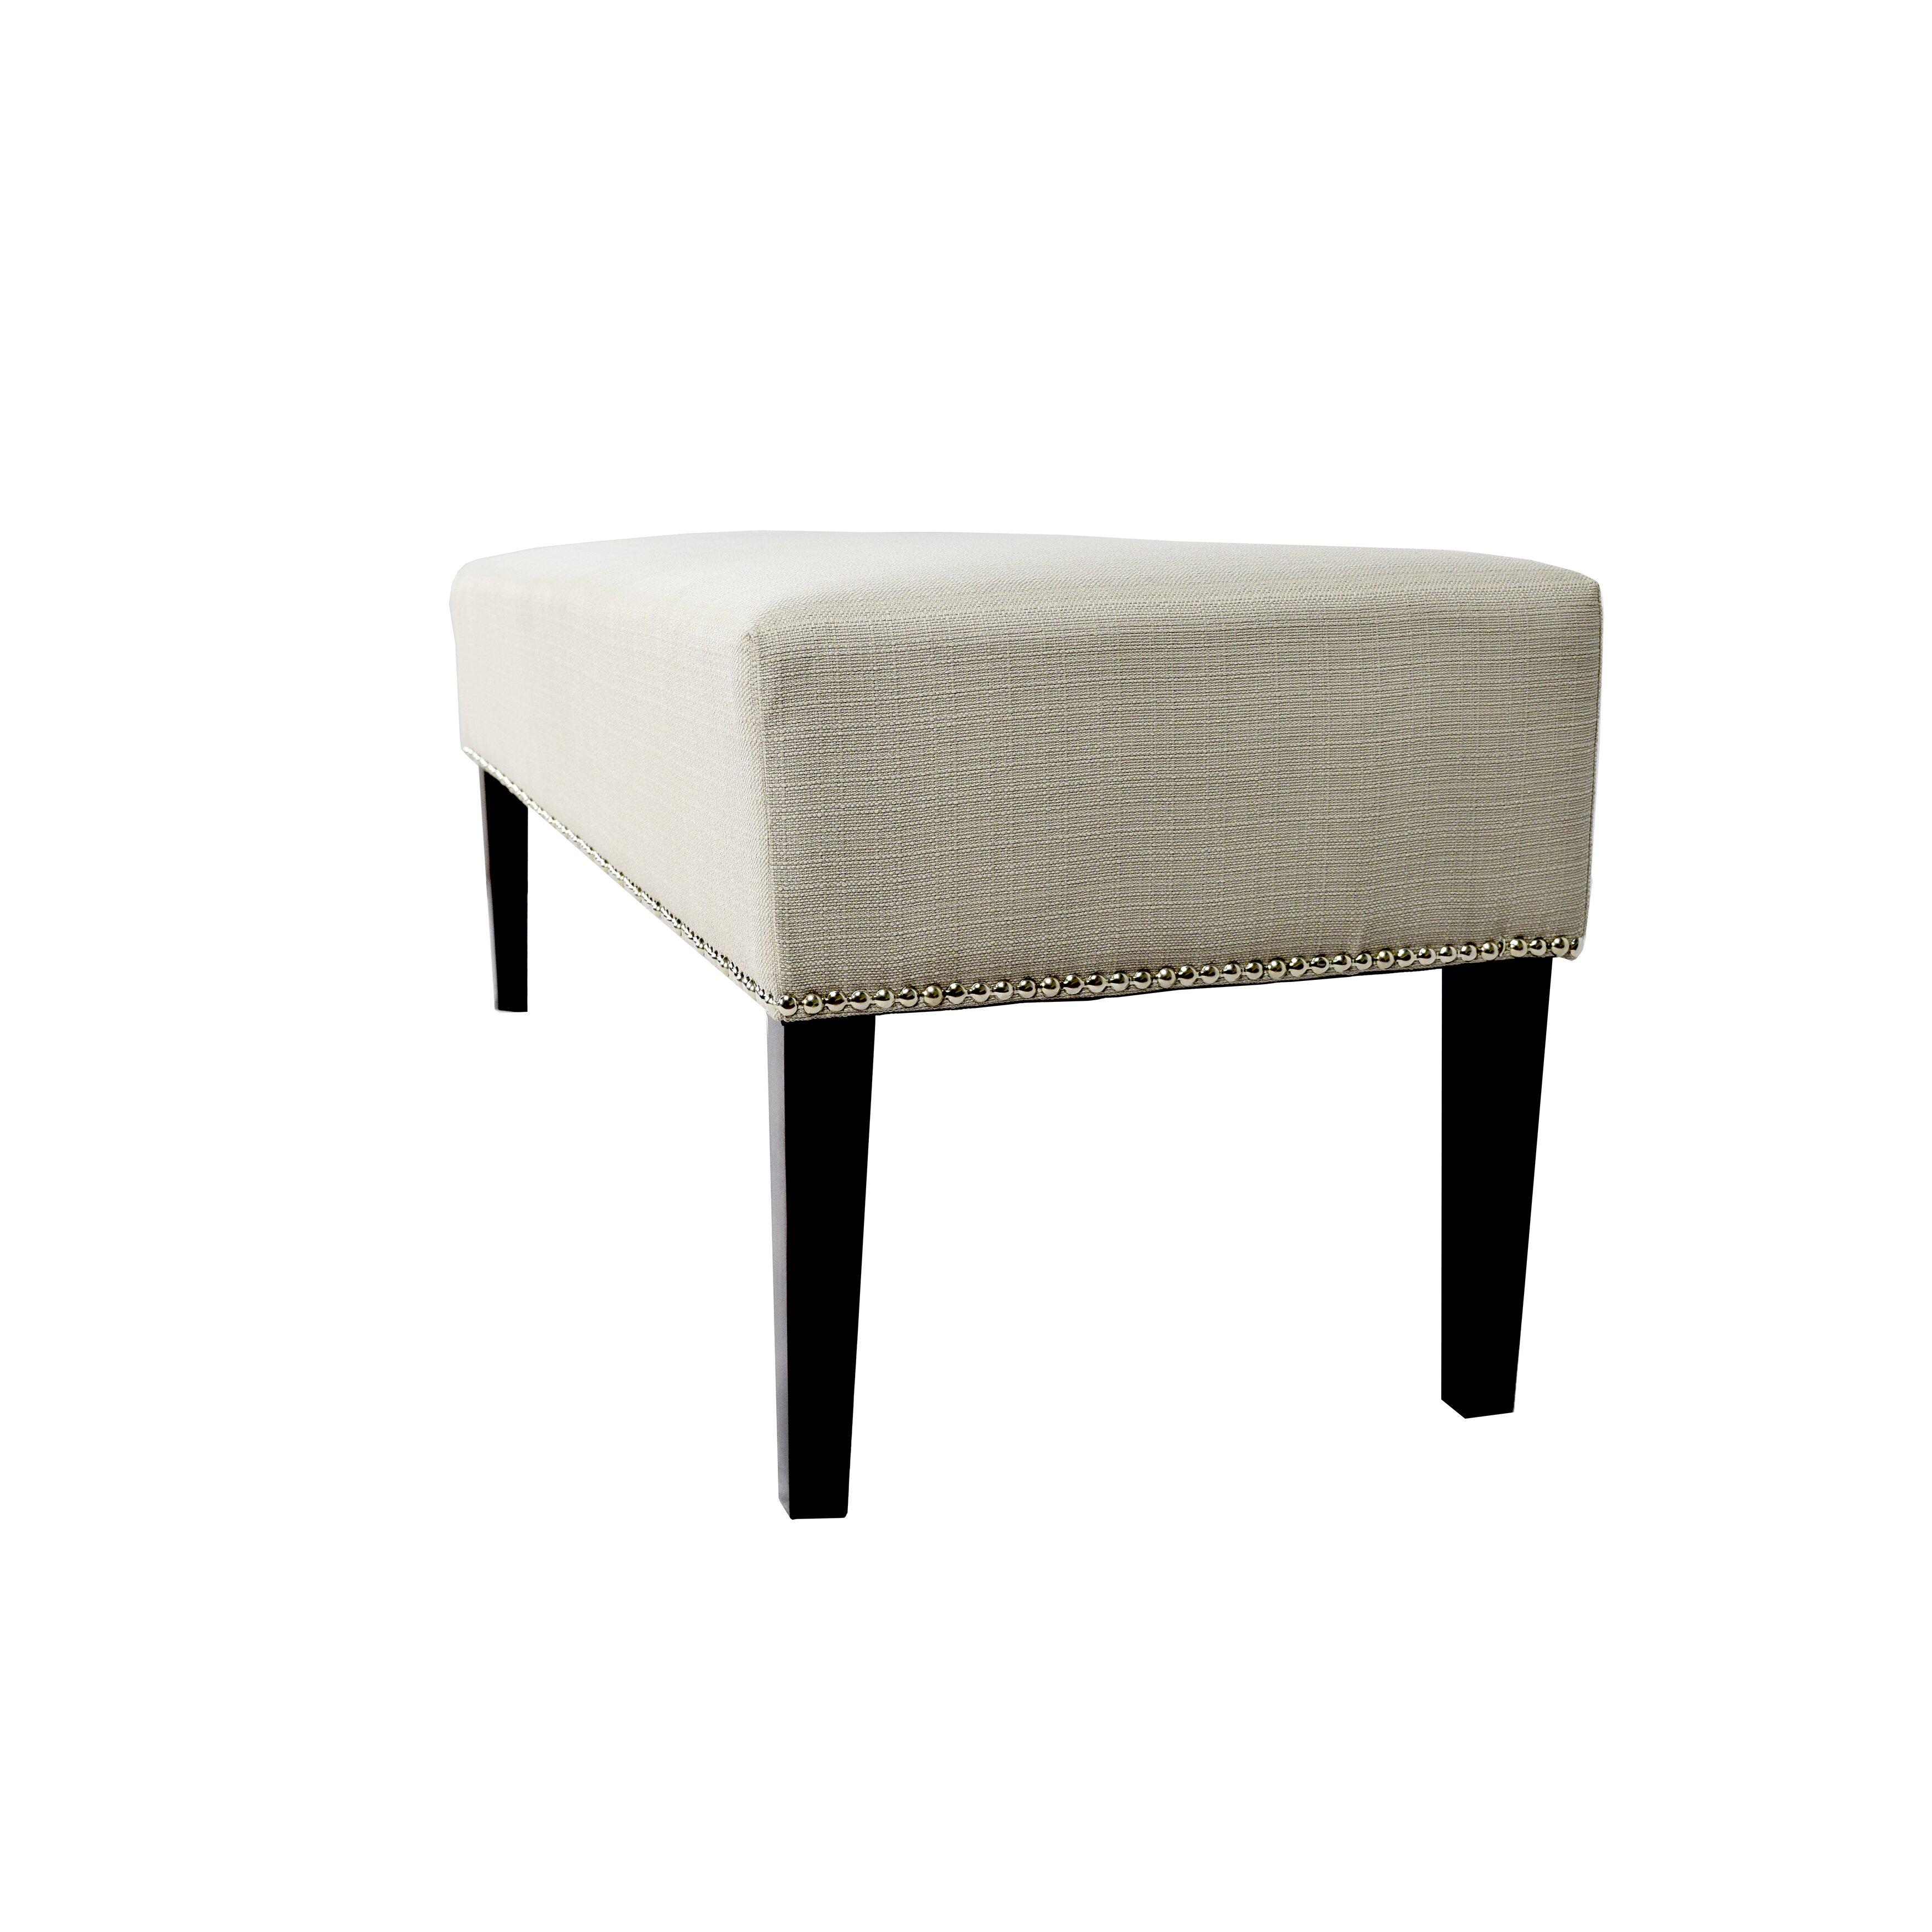 mjlfurniture roxanne upholstered bench reviews wayfair